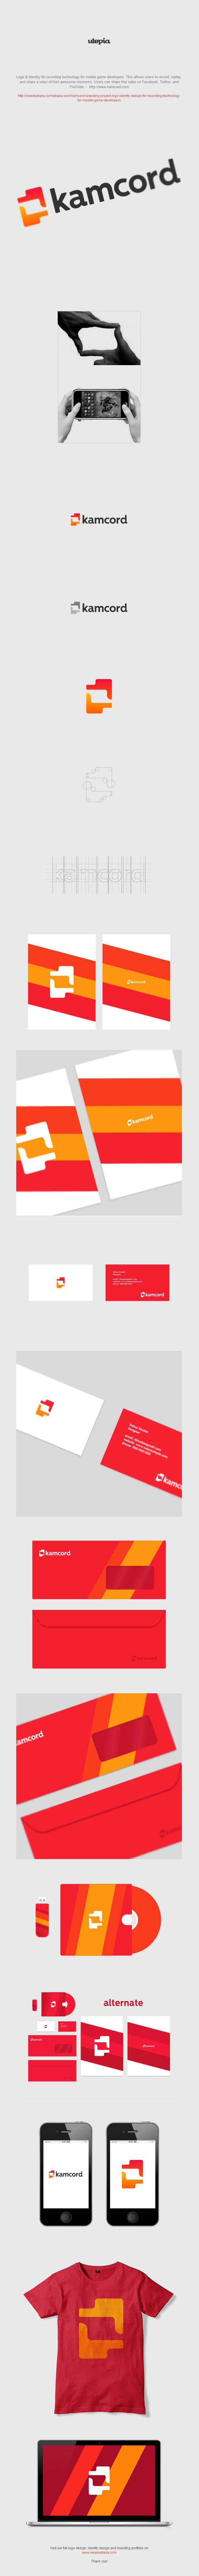 Design You Trust – Design Blog and Community